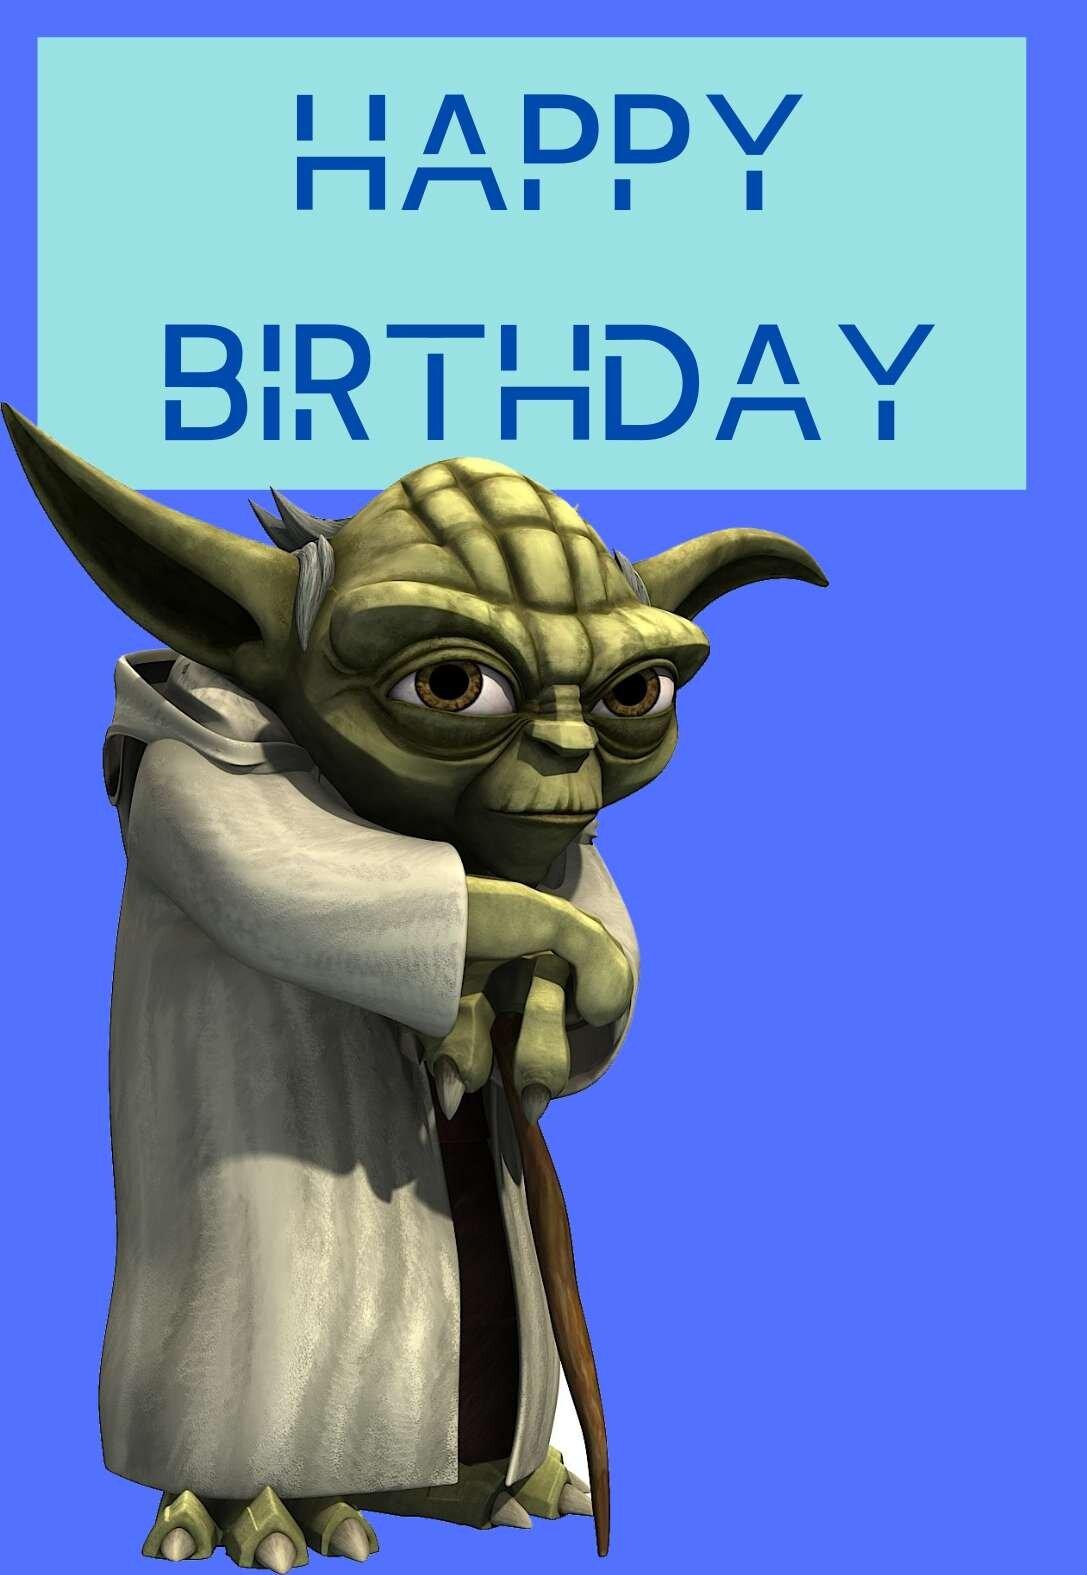 The Best Star Wars Printable Birthday Cards Free Printbirthday Cards